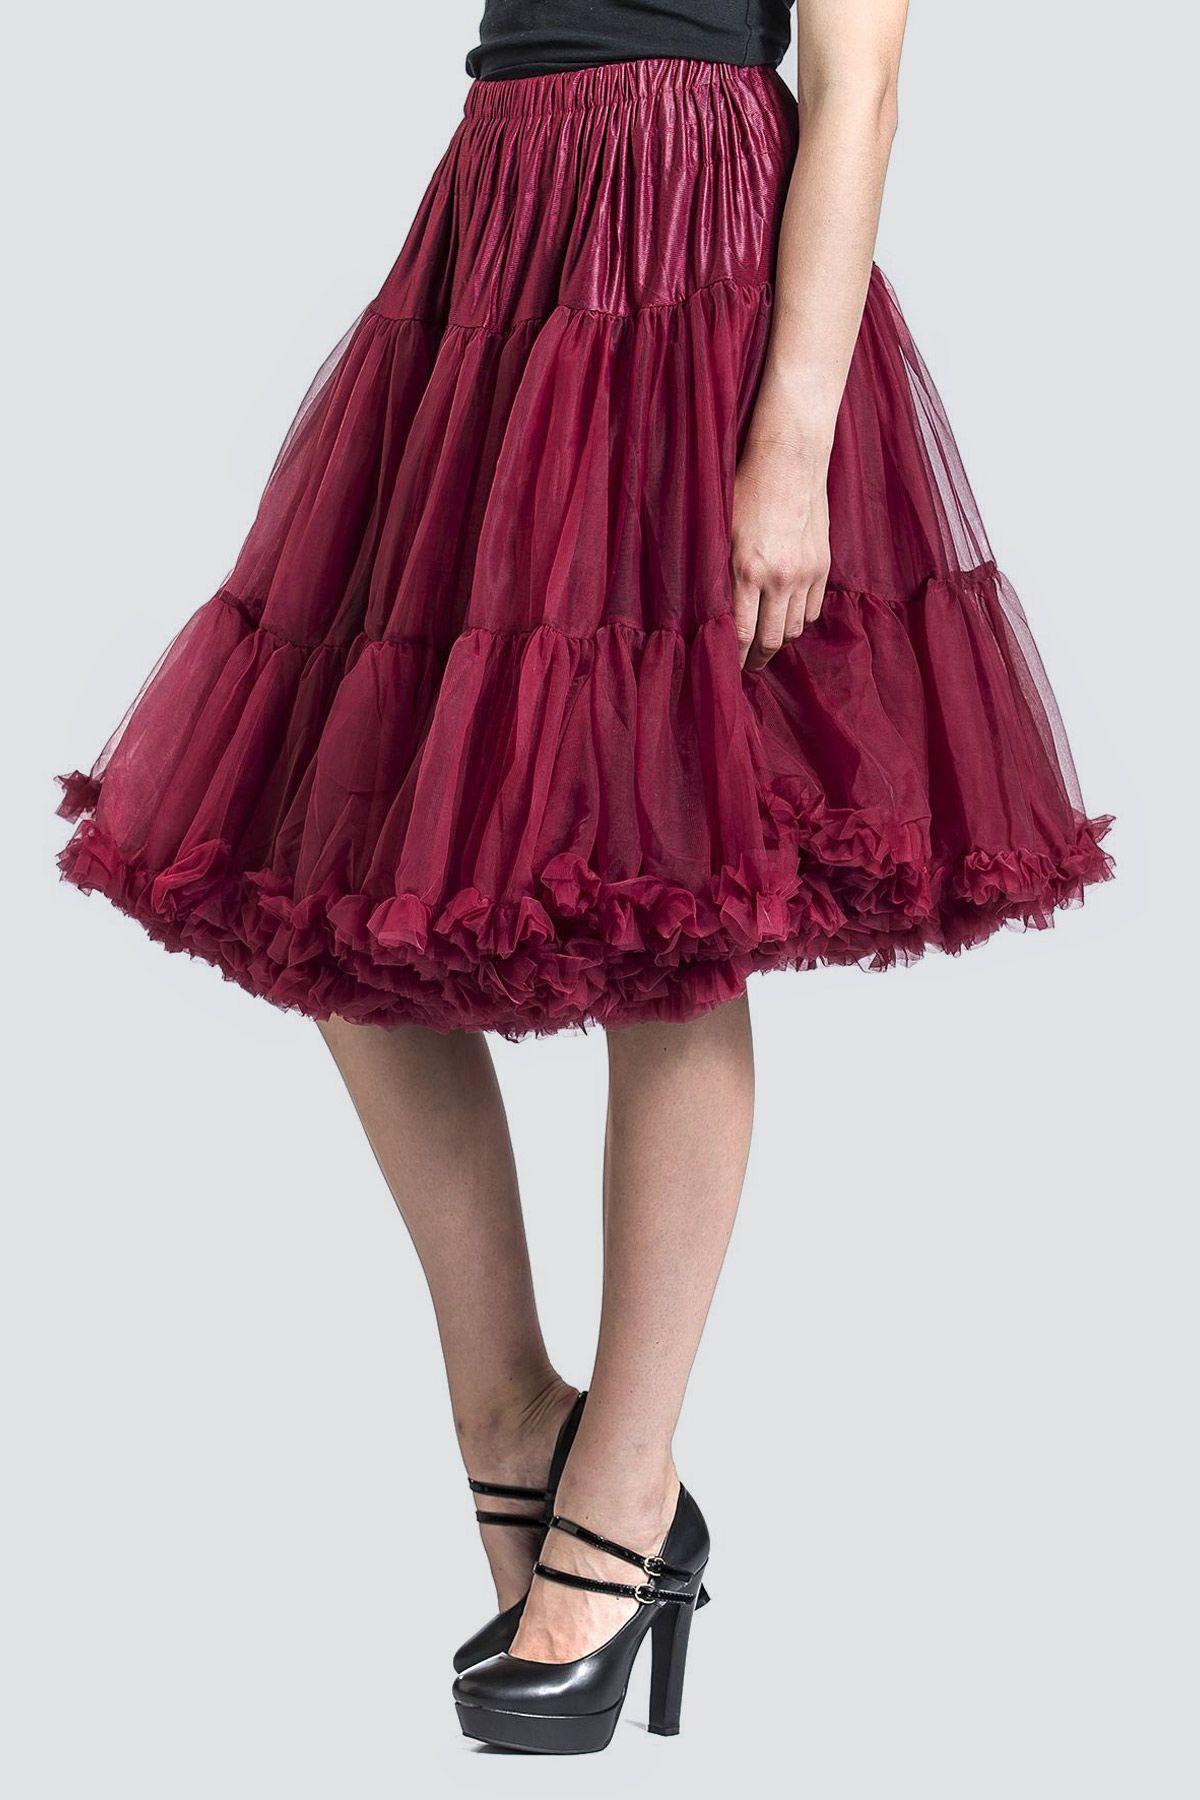 8c3a98eacd1c 50s Petticoat - London Βoutique